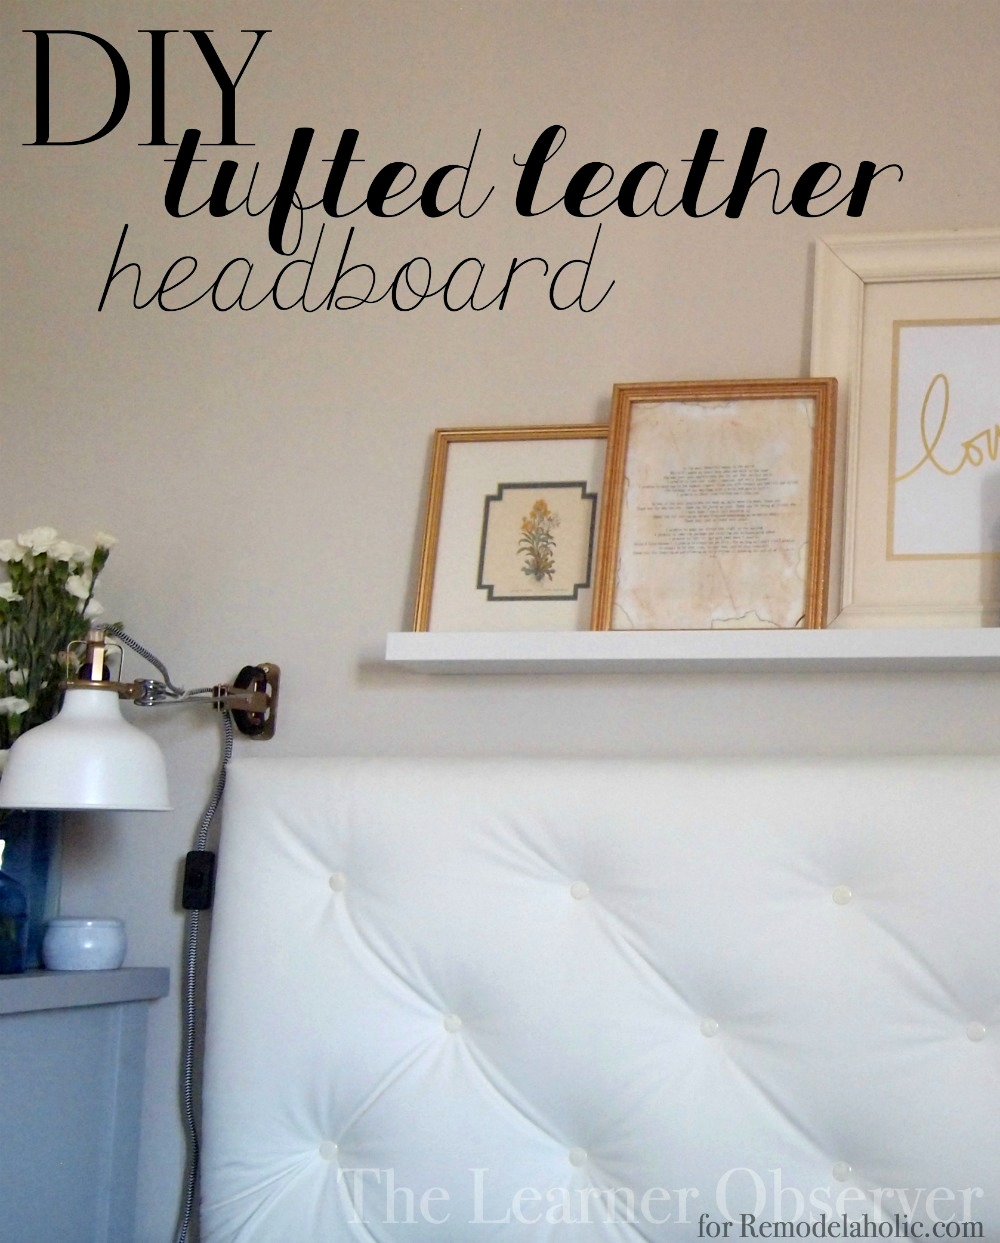 diy tufted leather headboard tutorial